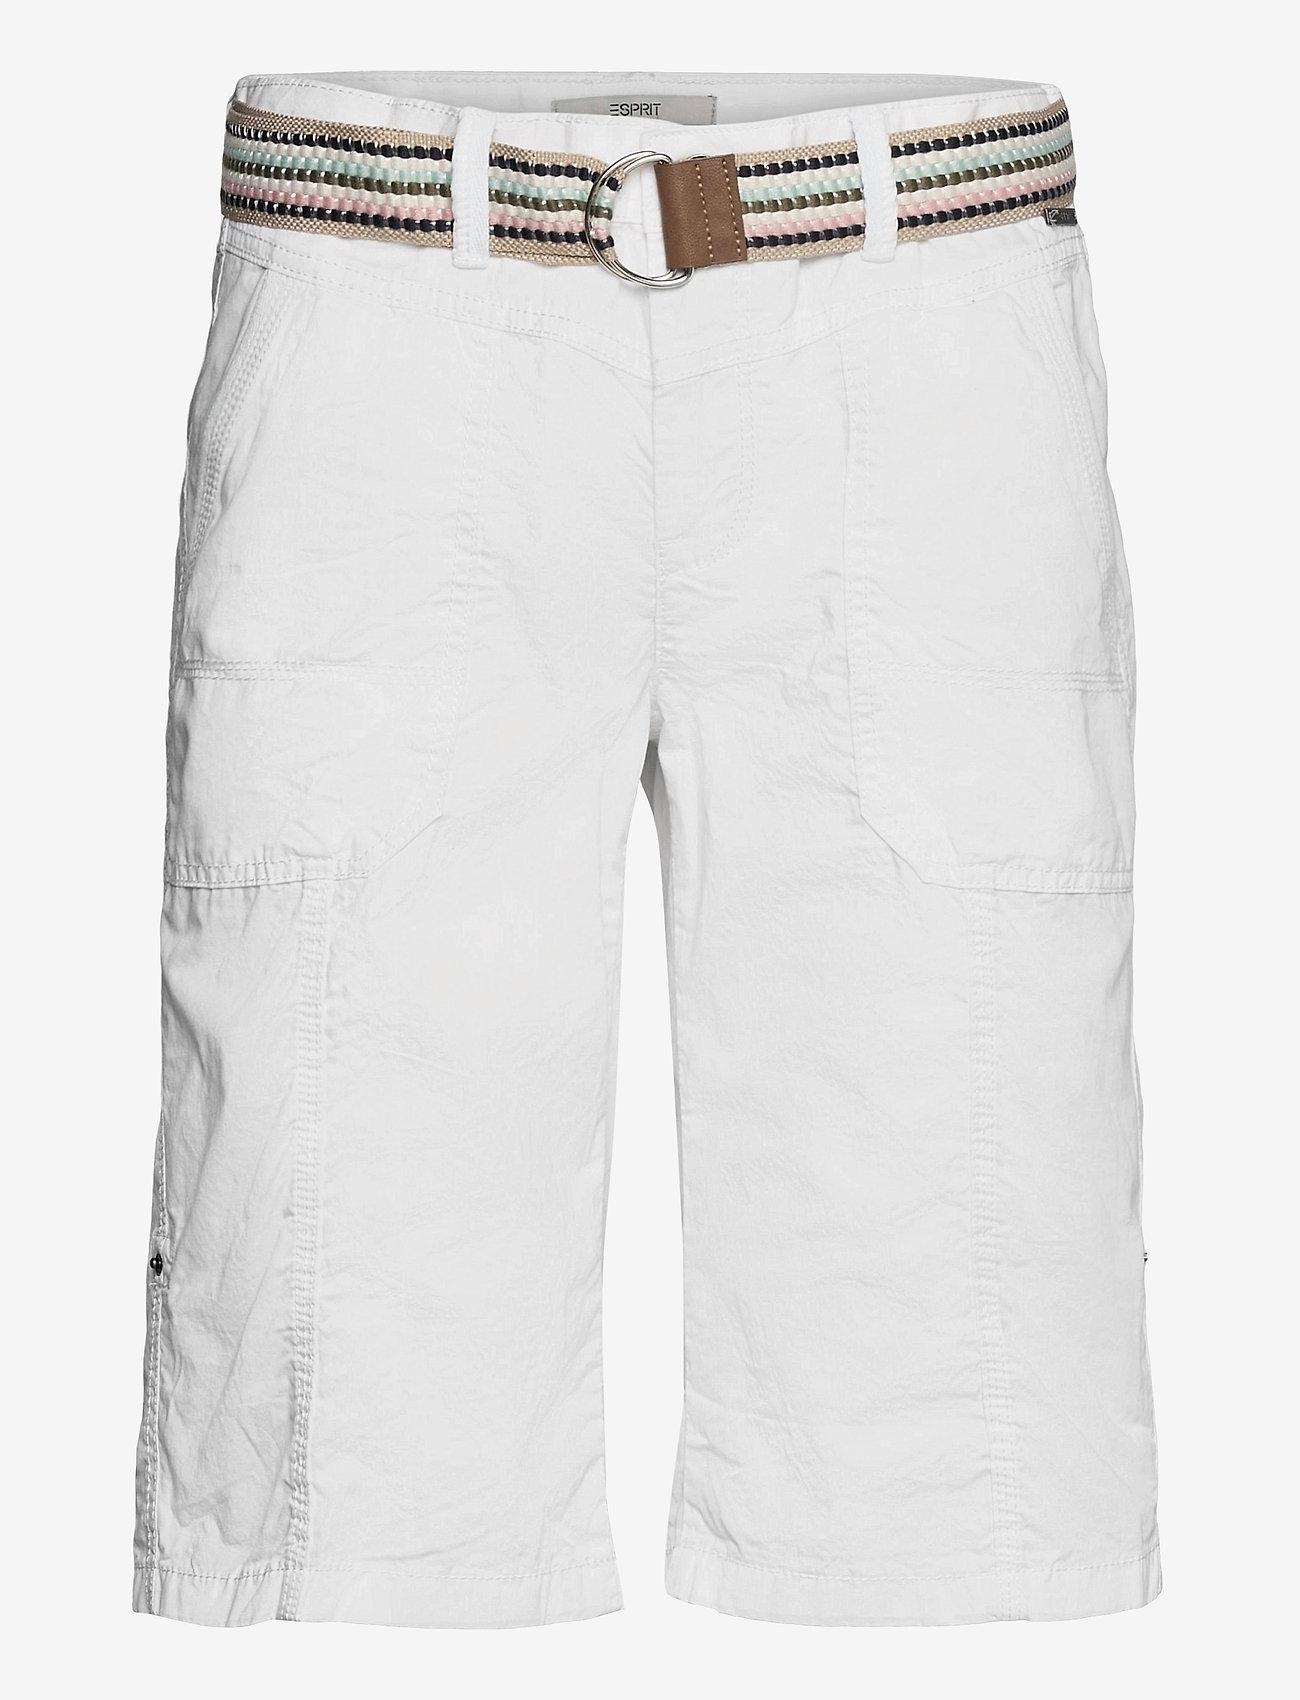 Esprit Casual - Shorts woven - bermudas - white - 0